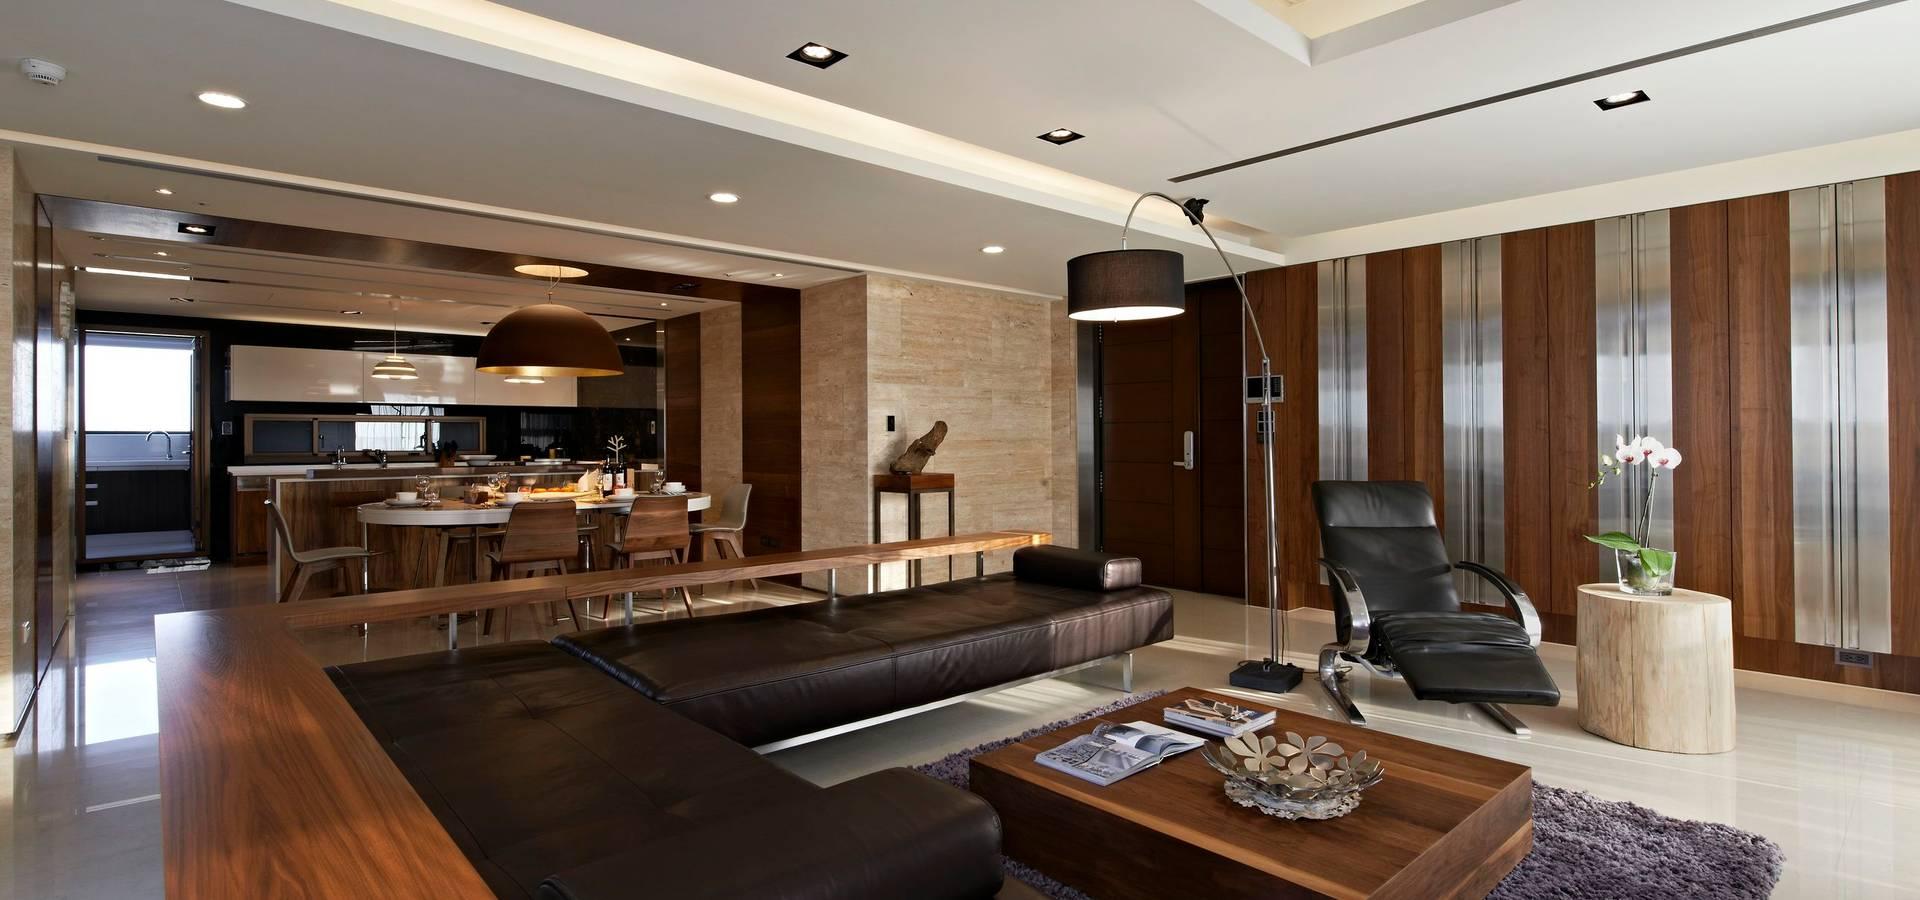 CCL Architects & Planners林祺錦建築師事務所